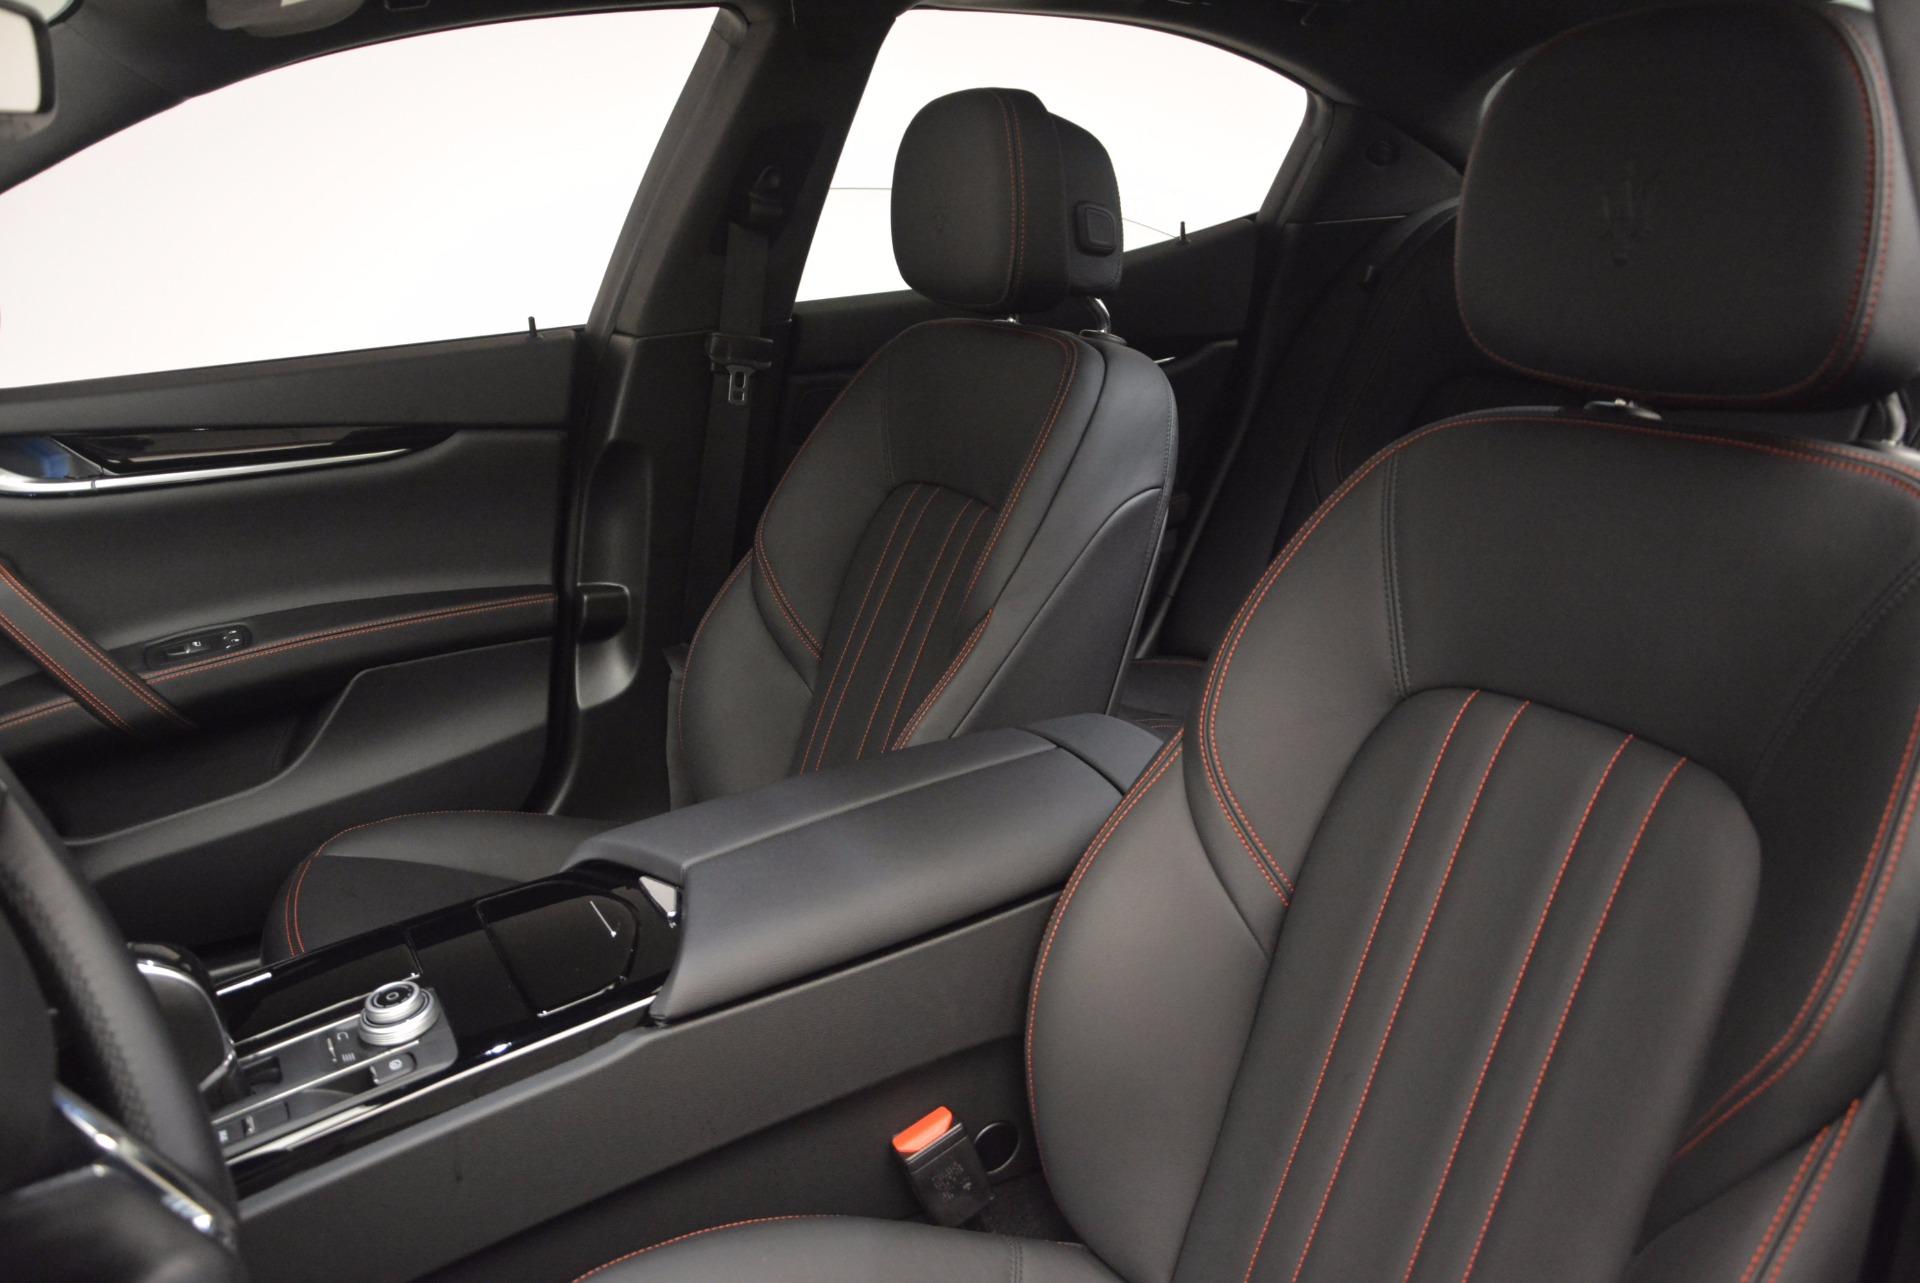 Used 2017 Maserati Ghibli SQ4 S Q4 Ex-Loaner For Sale In Westport, CT 1168_p15